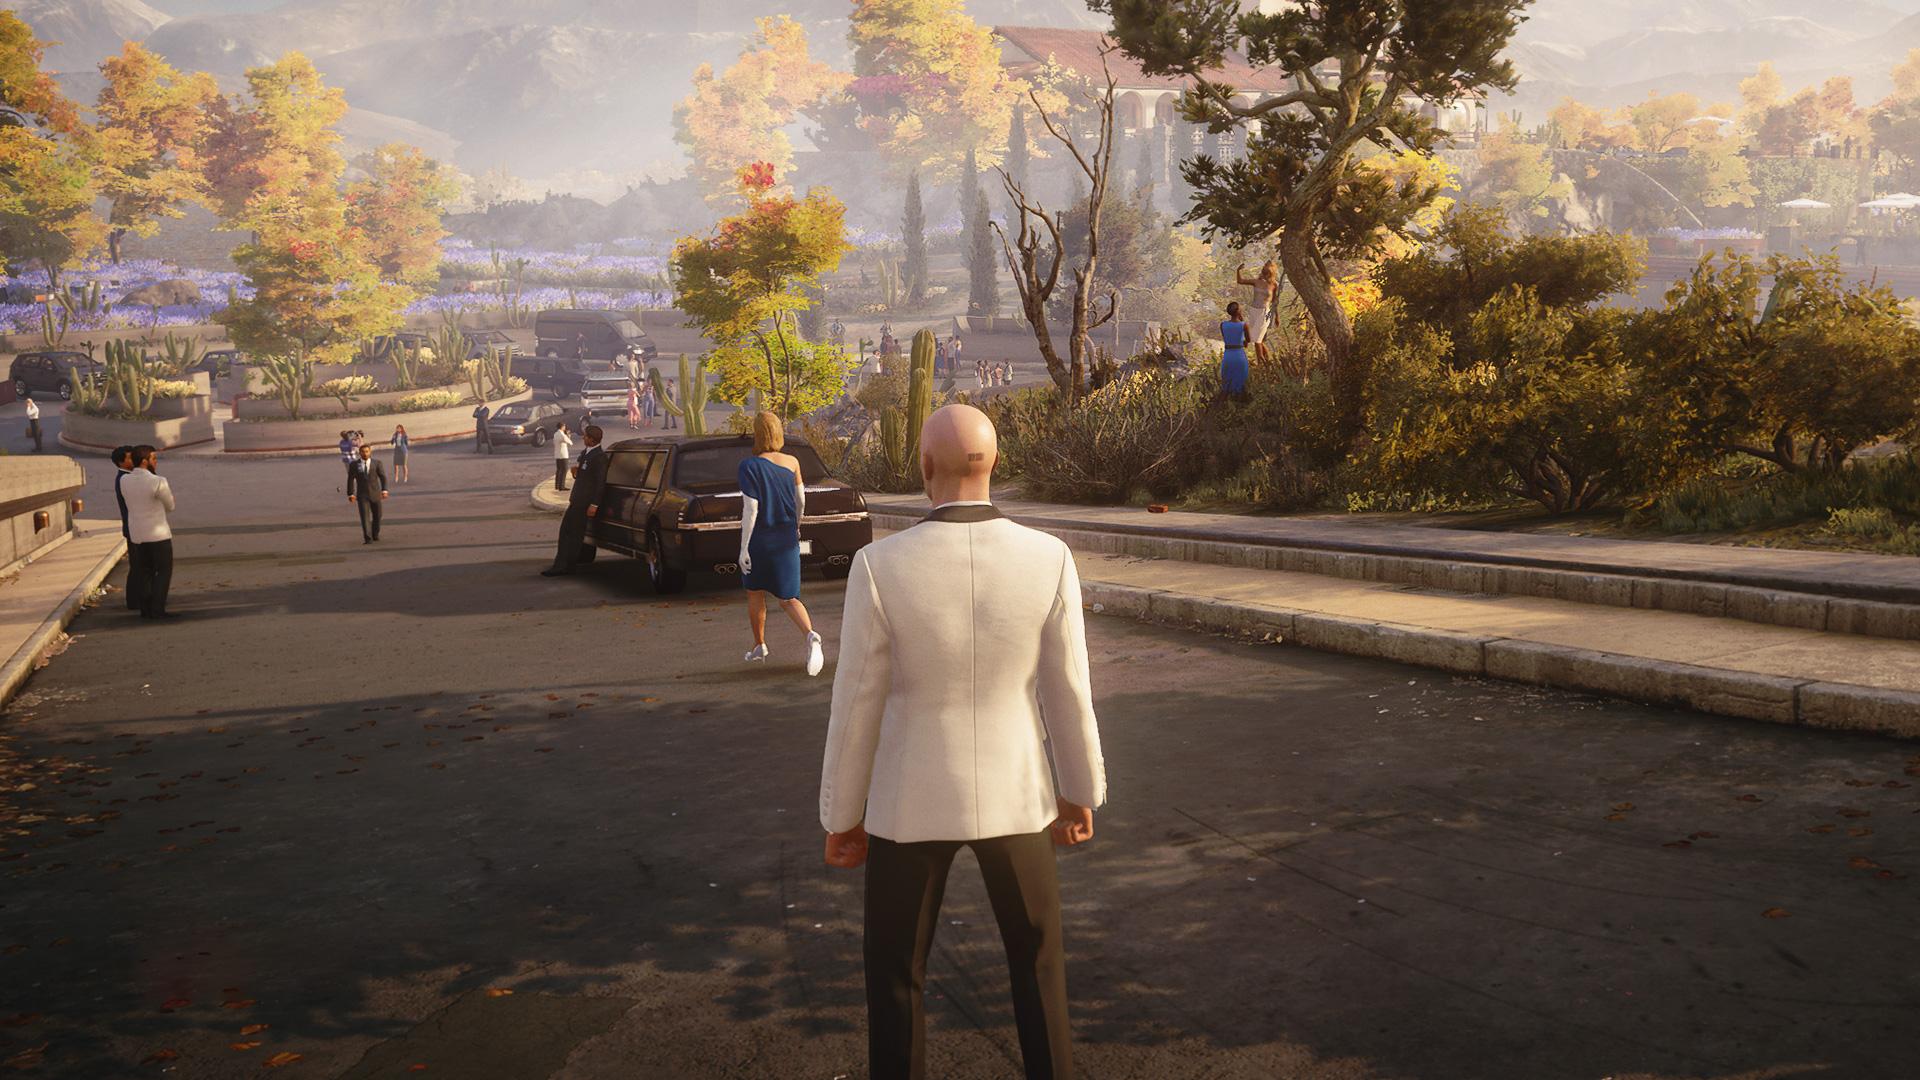 Hitman 3 Mendoza Silent Assassin, Suit Only walkthrough